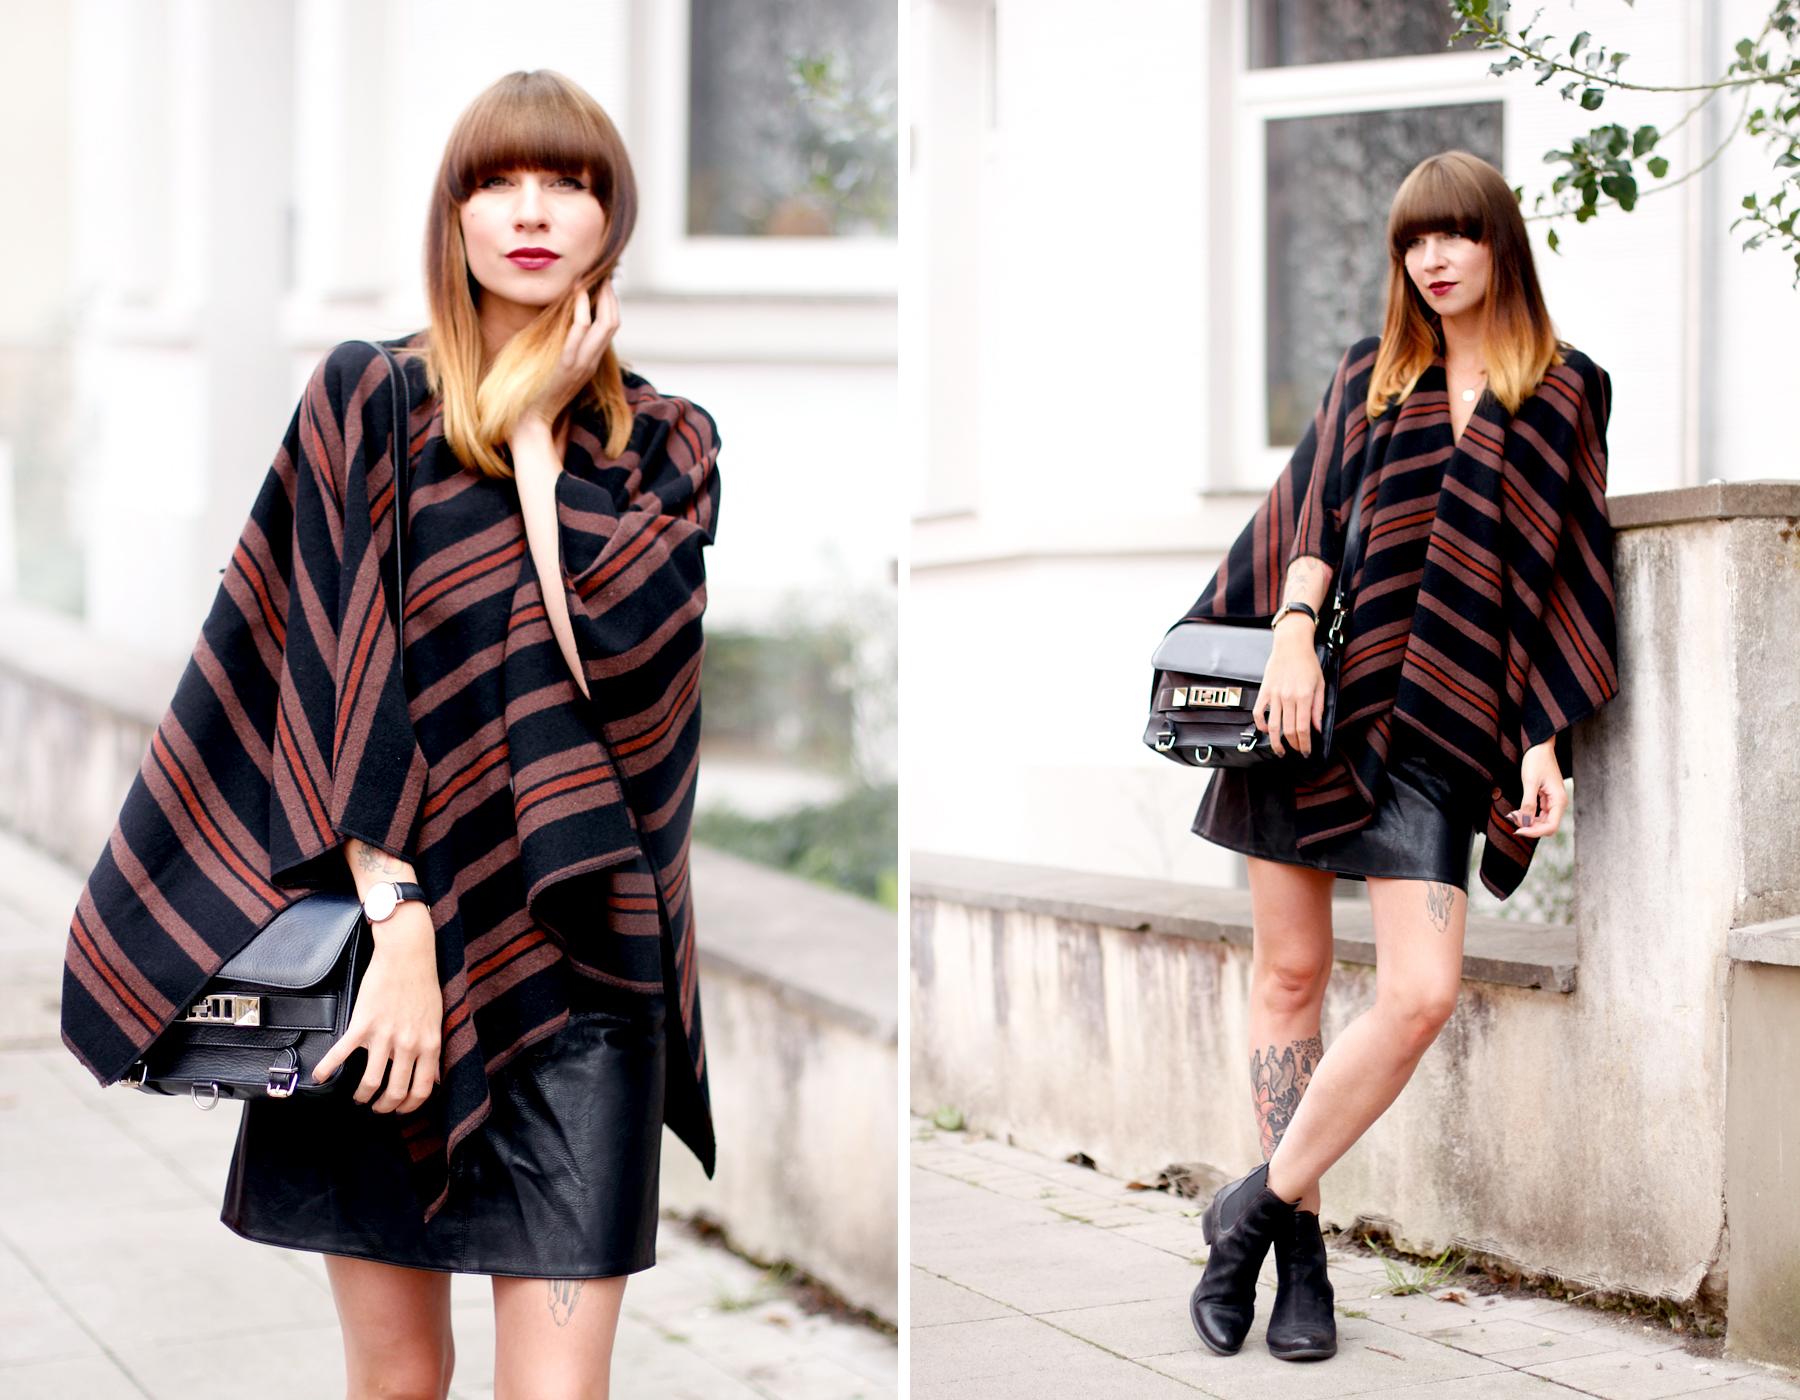 poncho lee jeans autumn cape boots sacha schuhe proenza schouler ps11 fashionblogger ricarda schernus blog düsseldorf hannover berlin cats & dogs 1